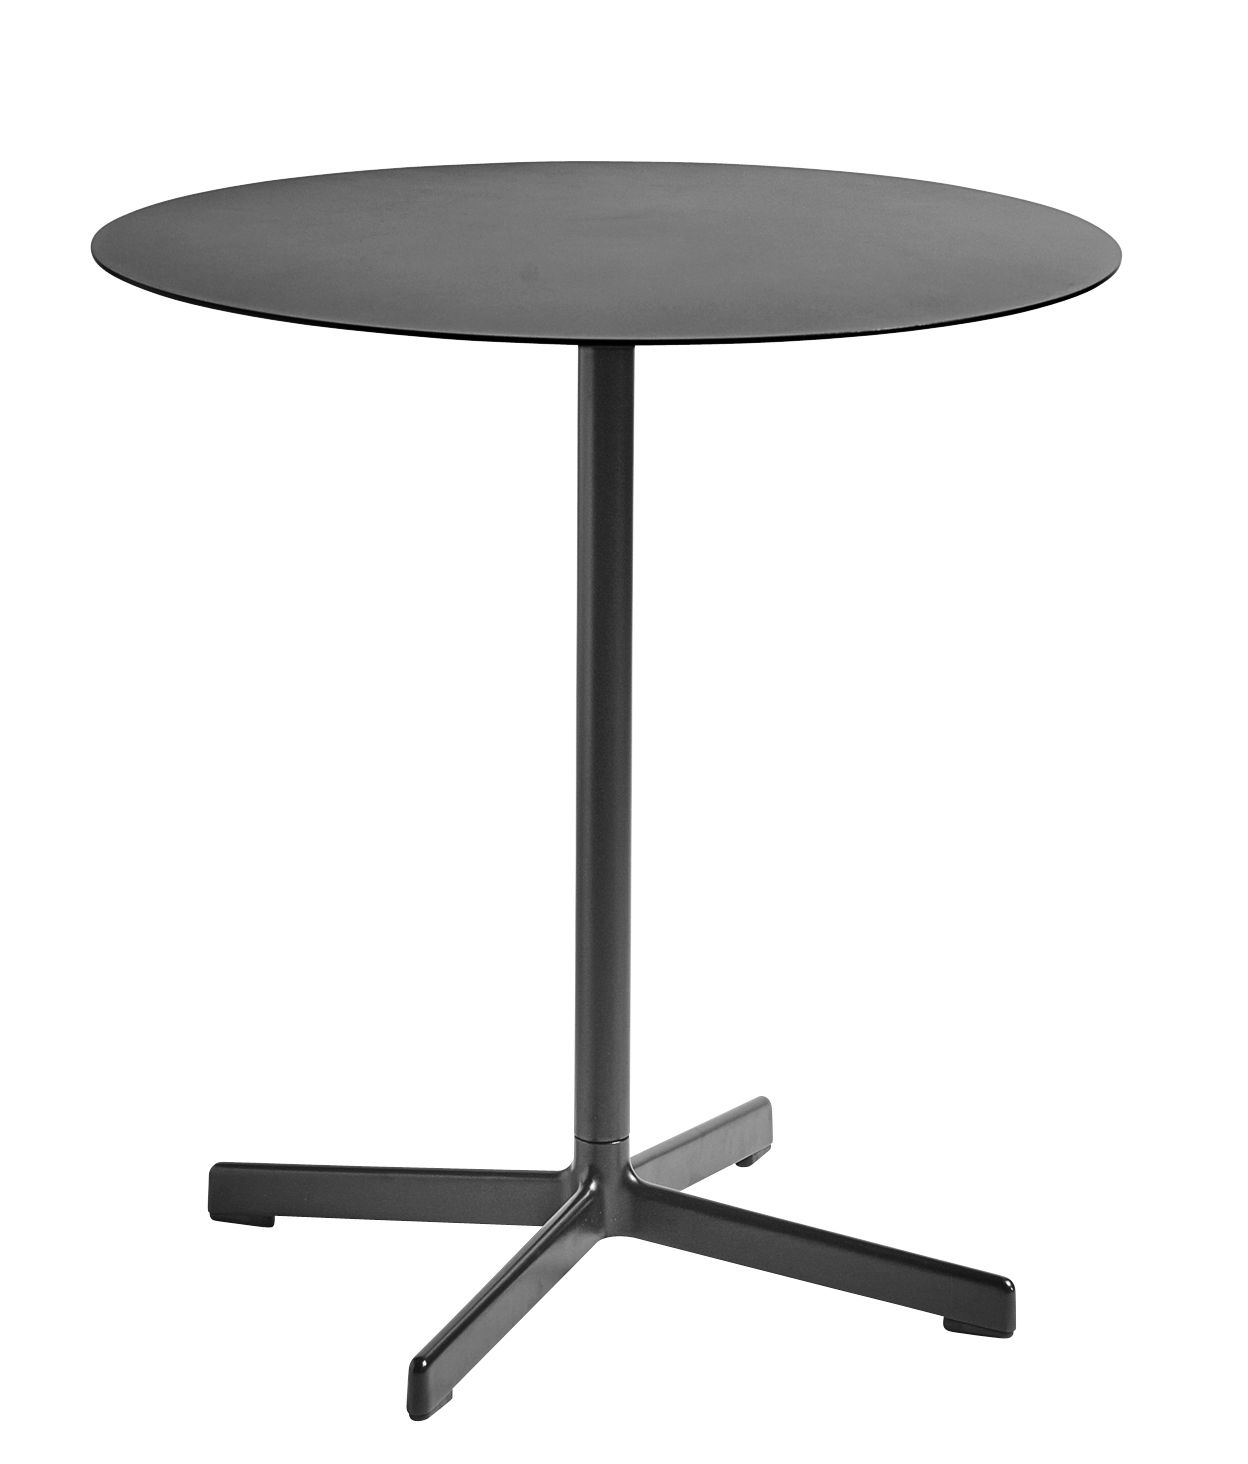 Outdoor - Tische - Neu Tisch / Ø 70 cm - Metall - Hay - Graphitschwarz - Acier laqué époxy, Aluminiumguss, epoxidlackiert